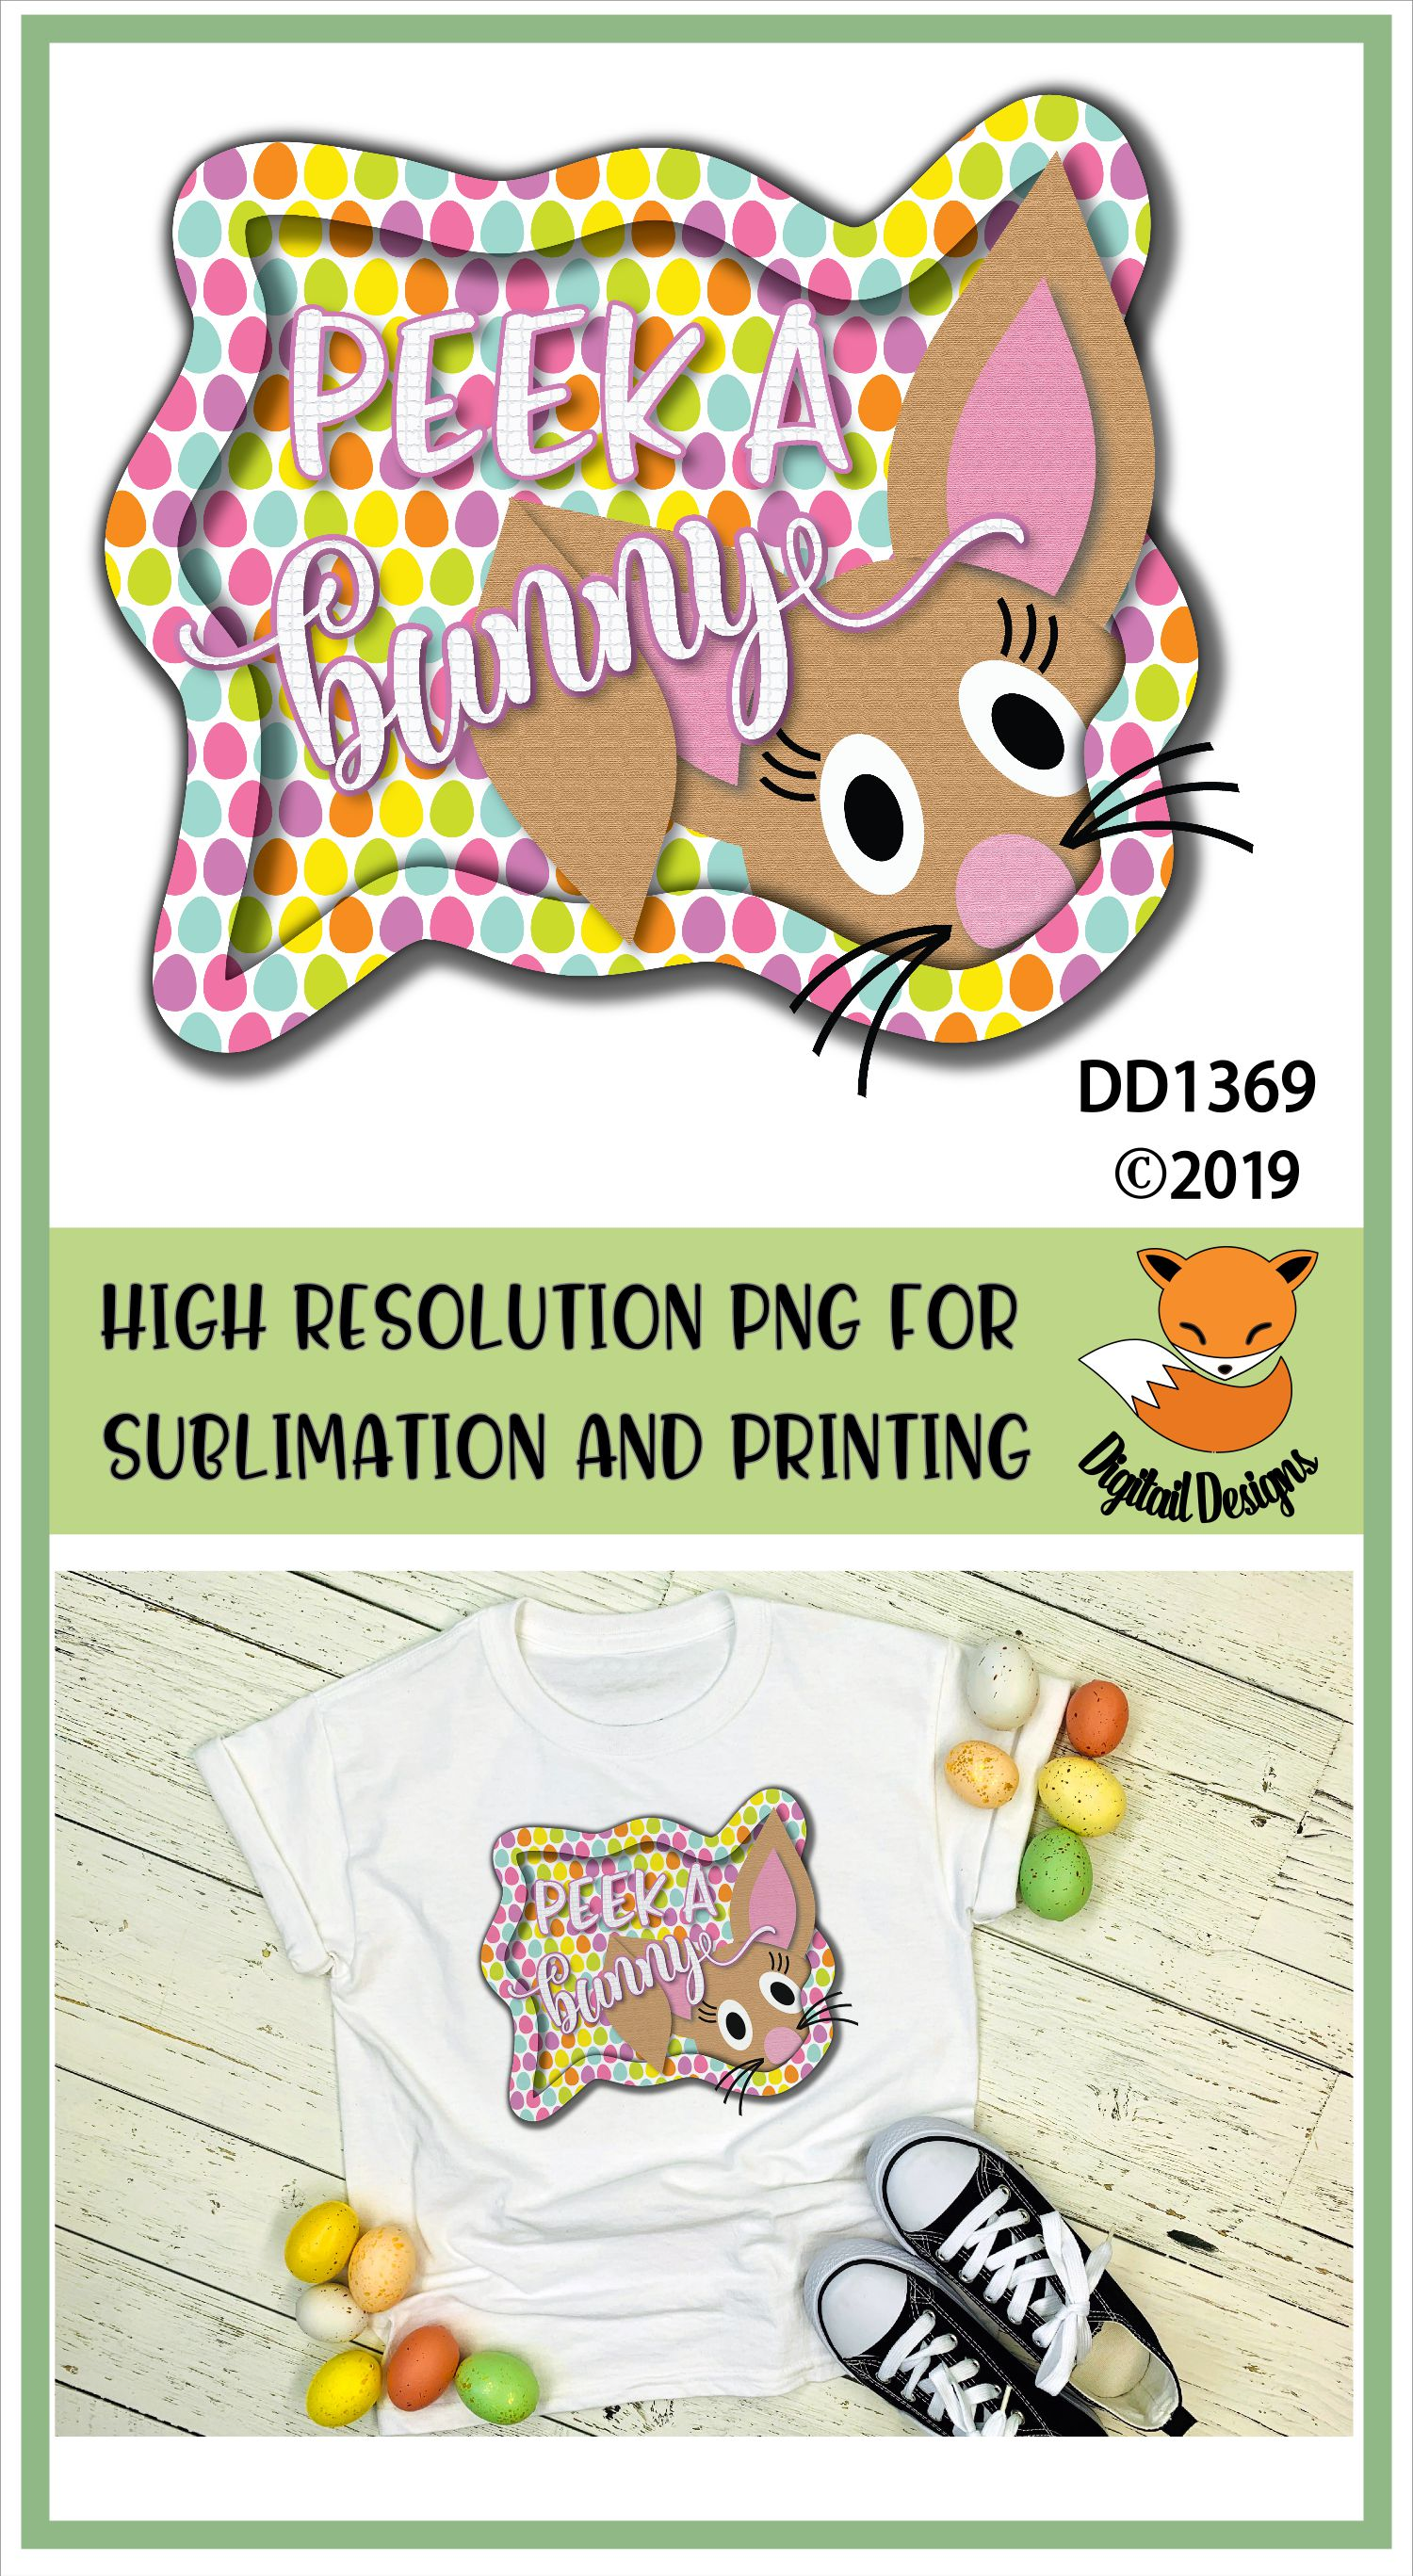 Peeking Easter Bunny Sublimation Printable example image 2